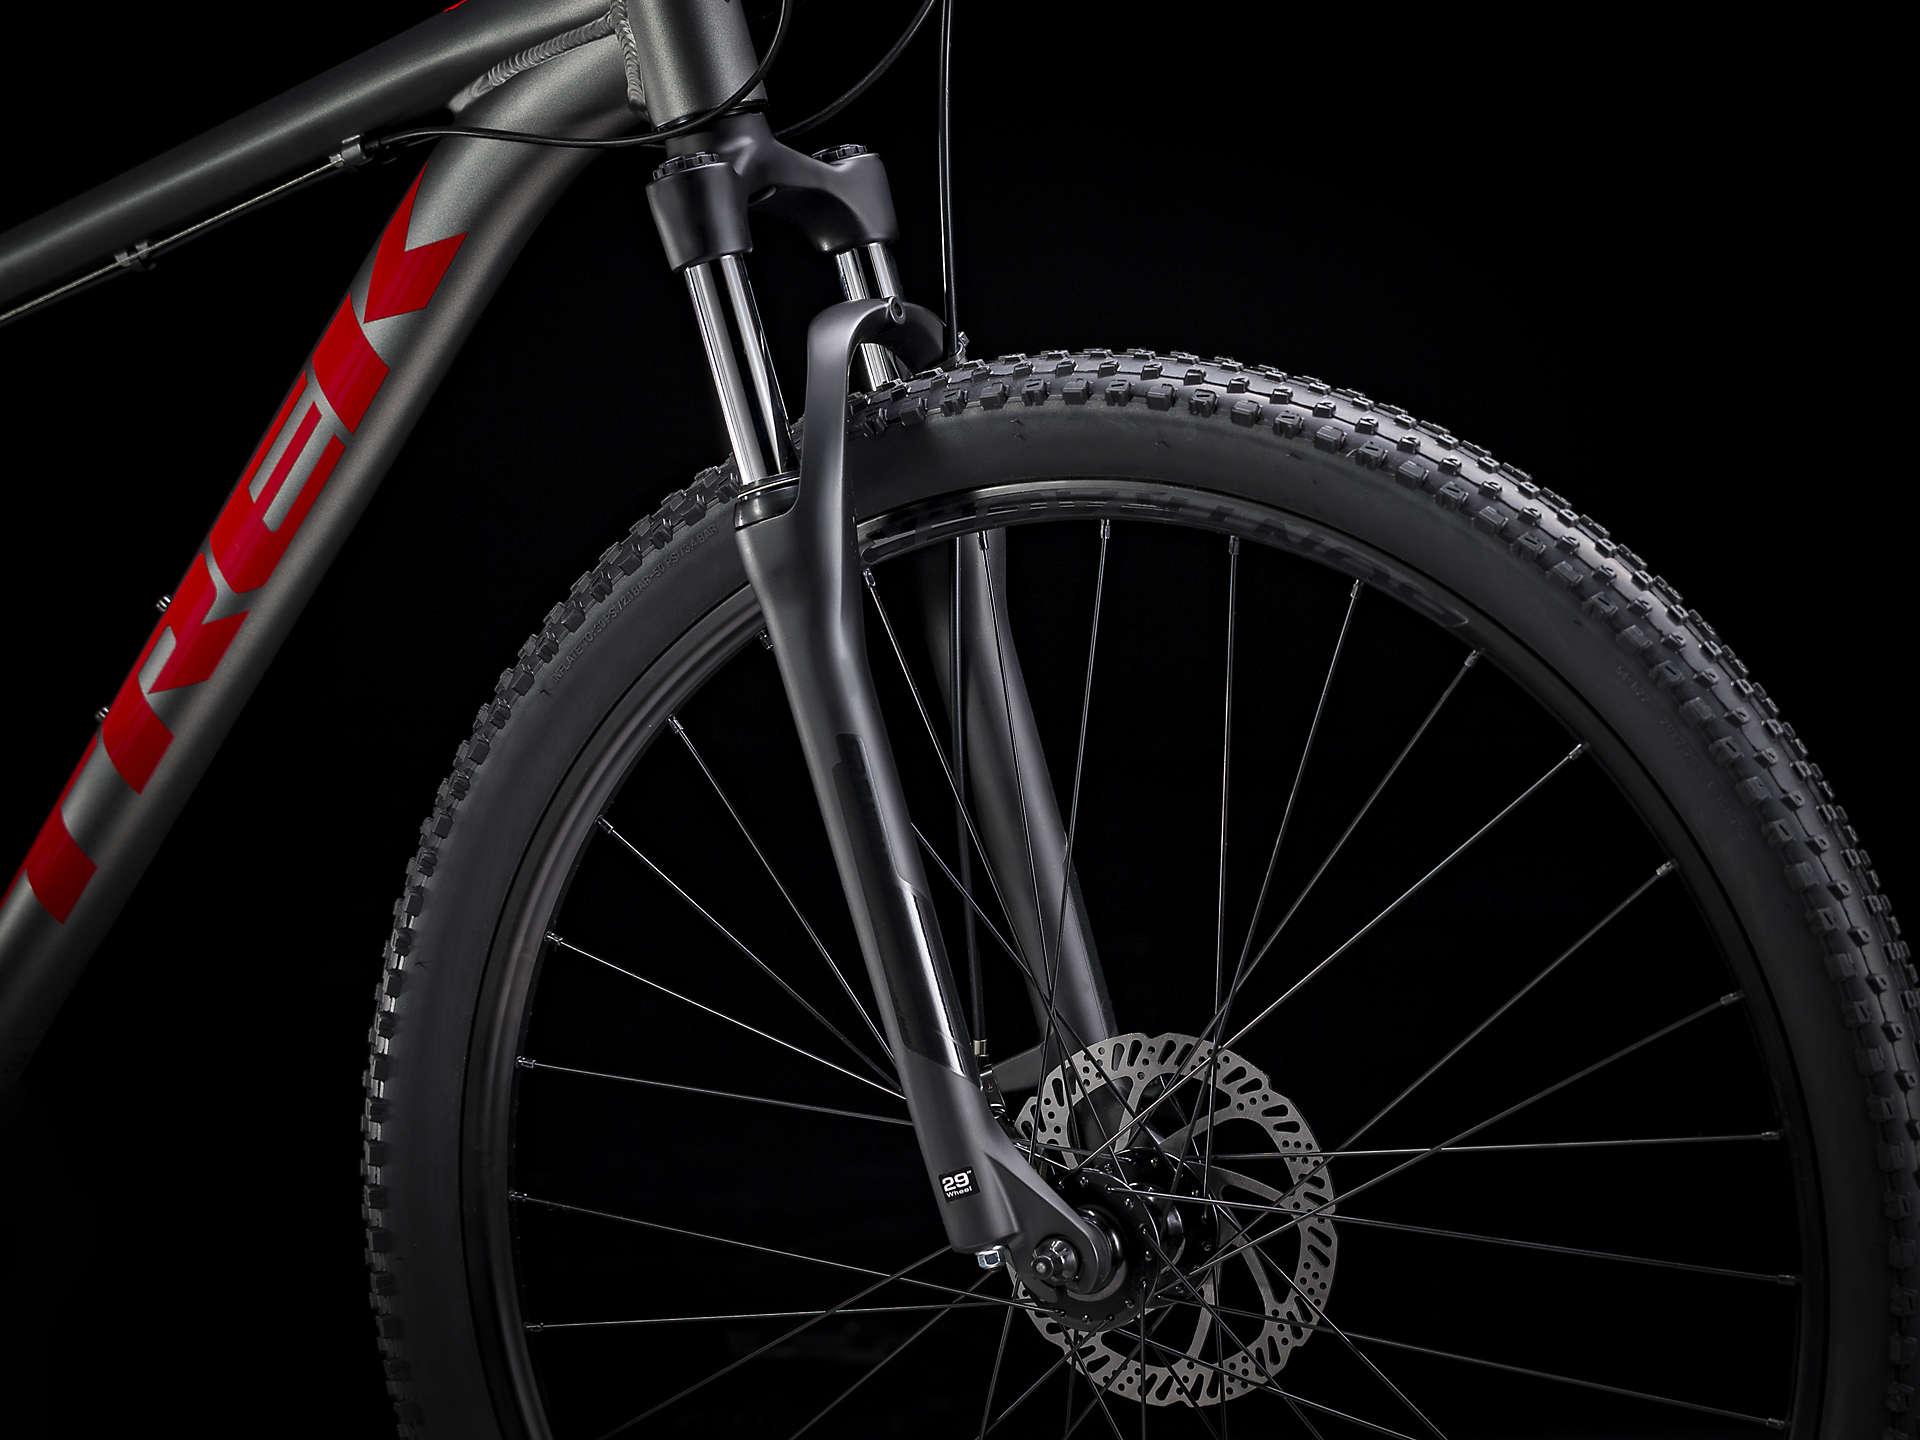 Bicicleta Trek  Marlin 4 2020 Tamanho 15,5